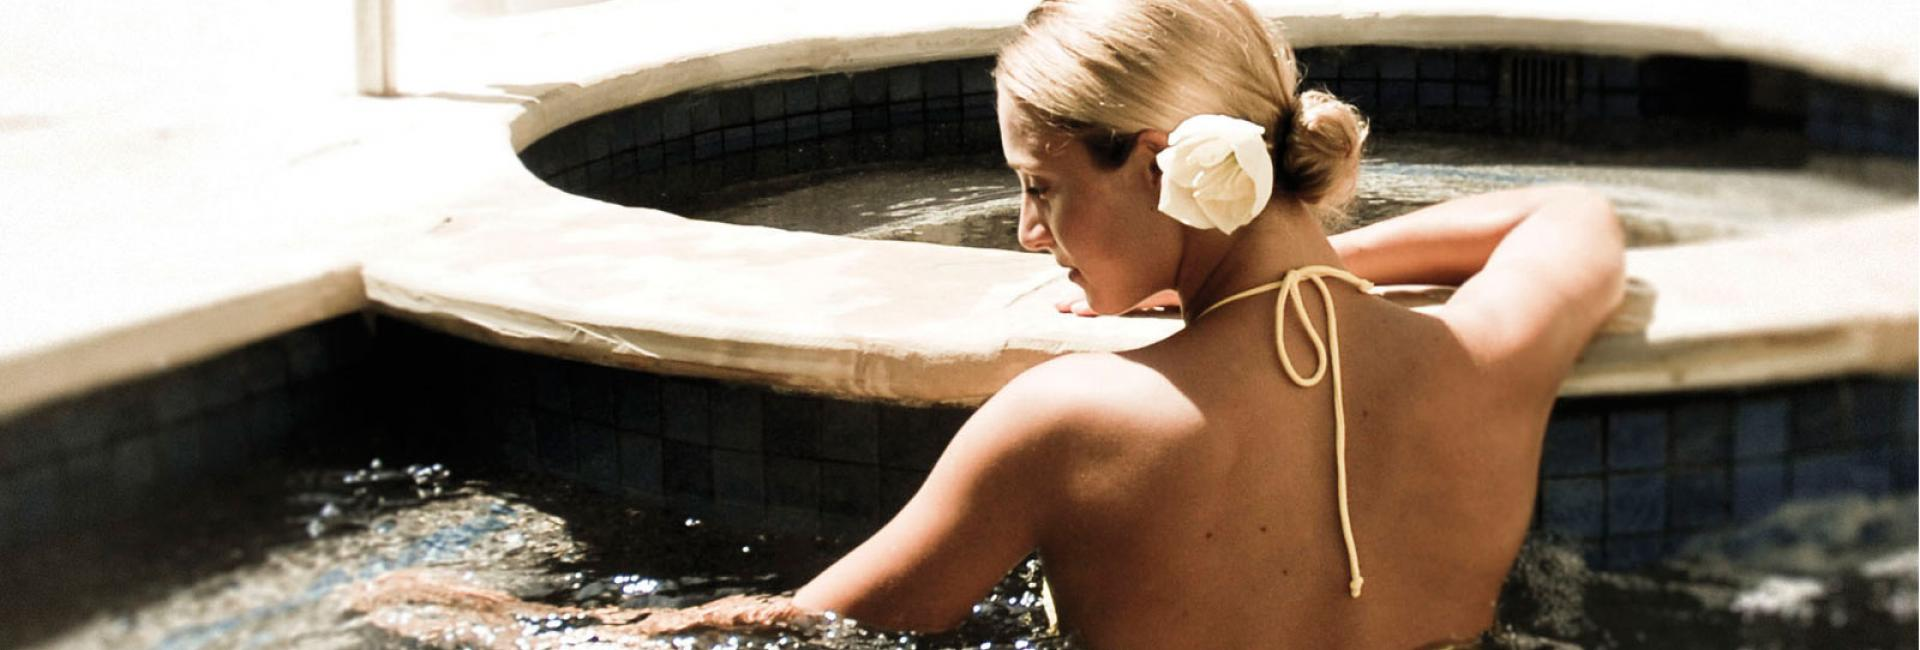 spa-at-hacienda-beach-club-residences